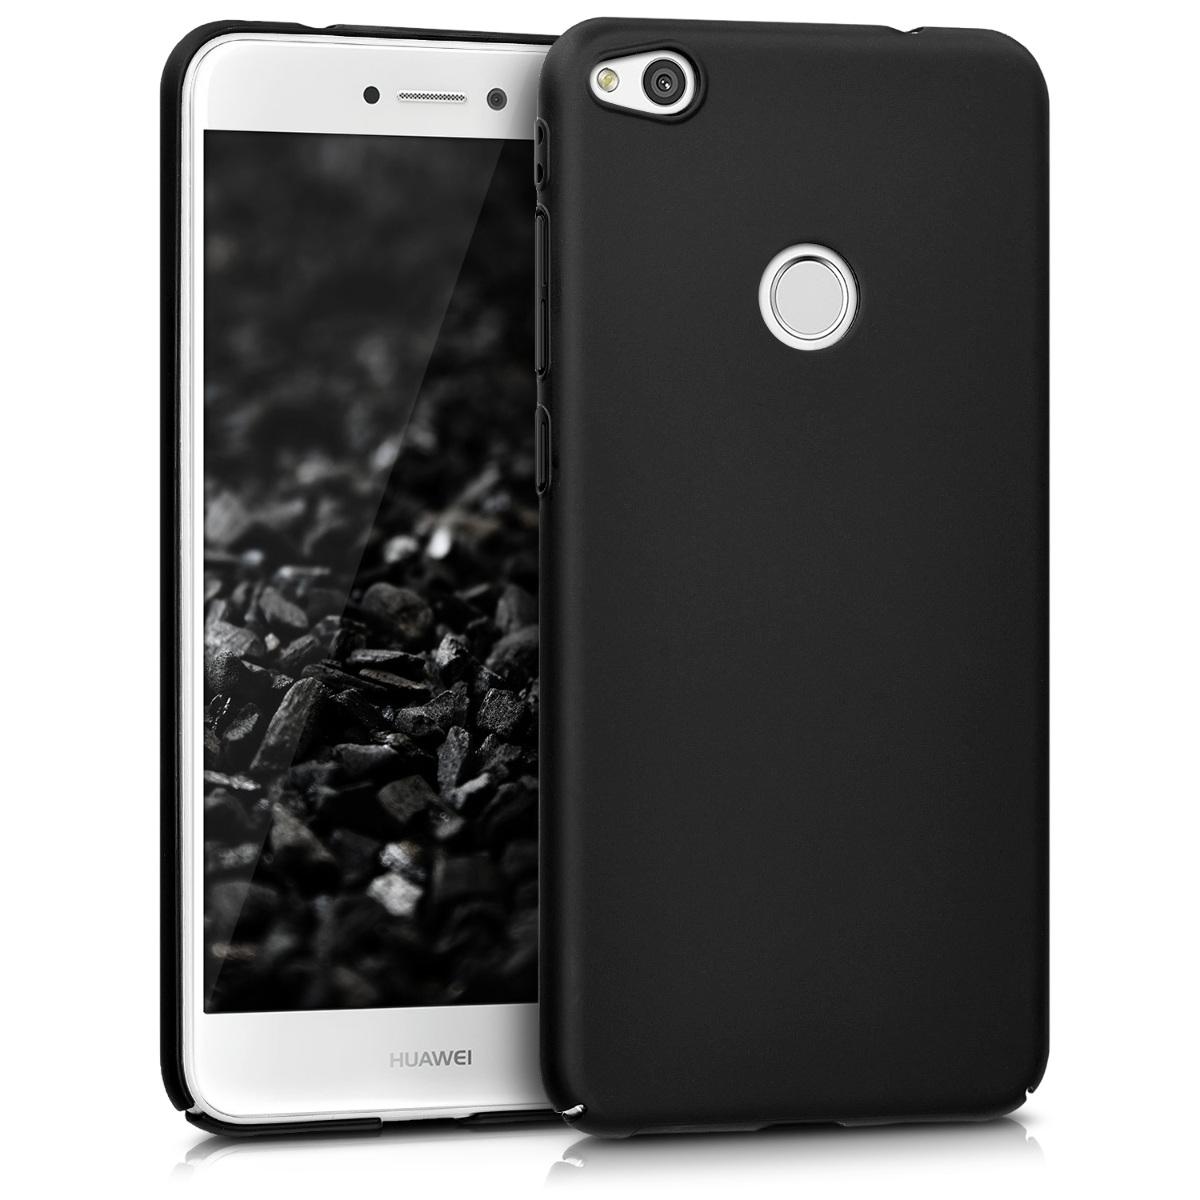 KW Slim Anti-Slip Cover - Σκληρή Θήκη Καουτσούκ Huawei P8 / P9 Lite (2017) - Μαύρο μεταλλικό (42369.68)